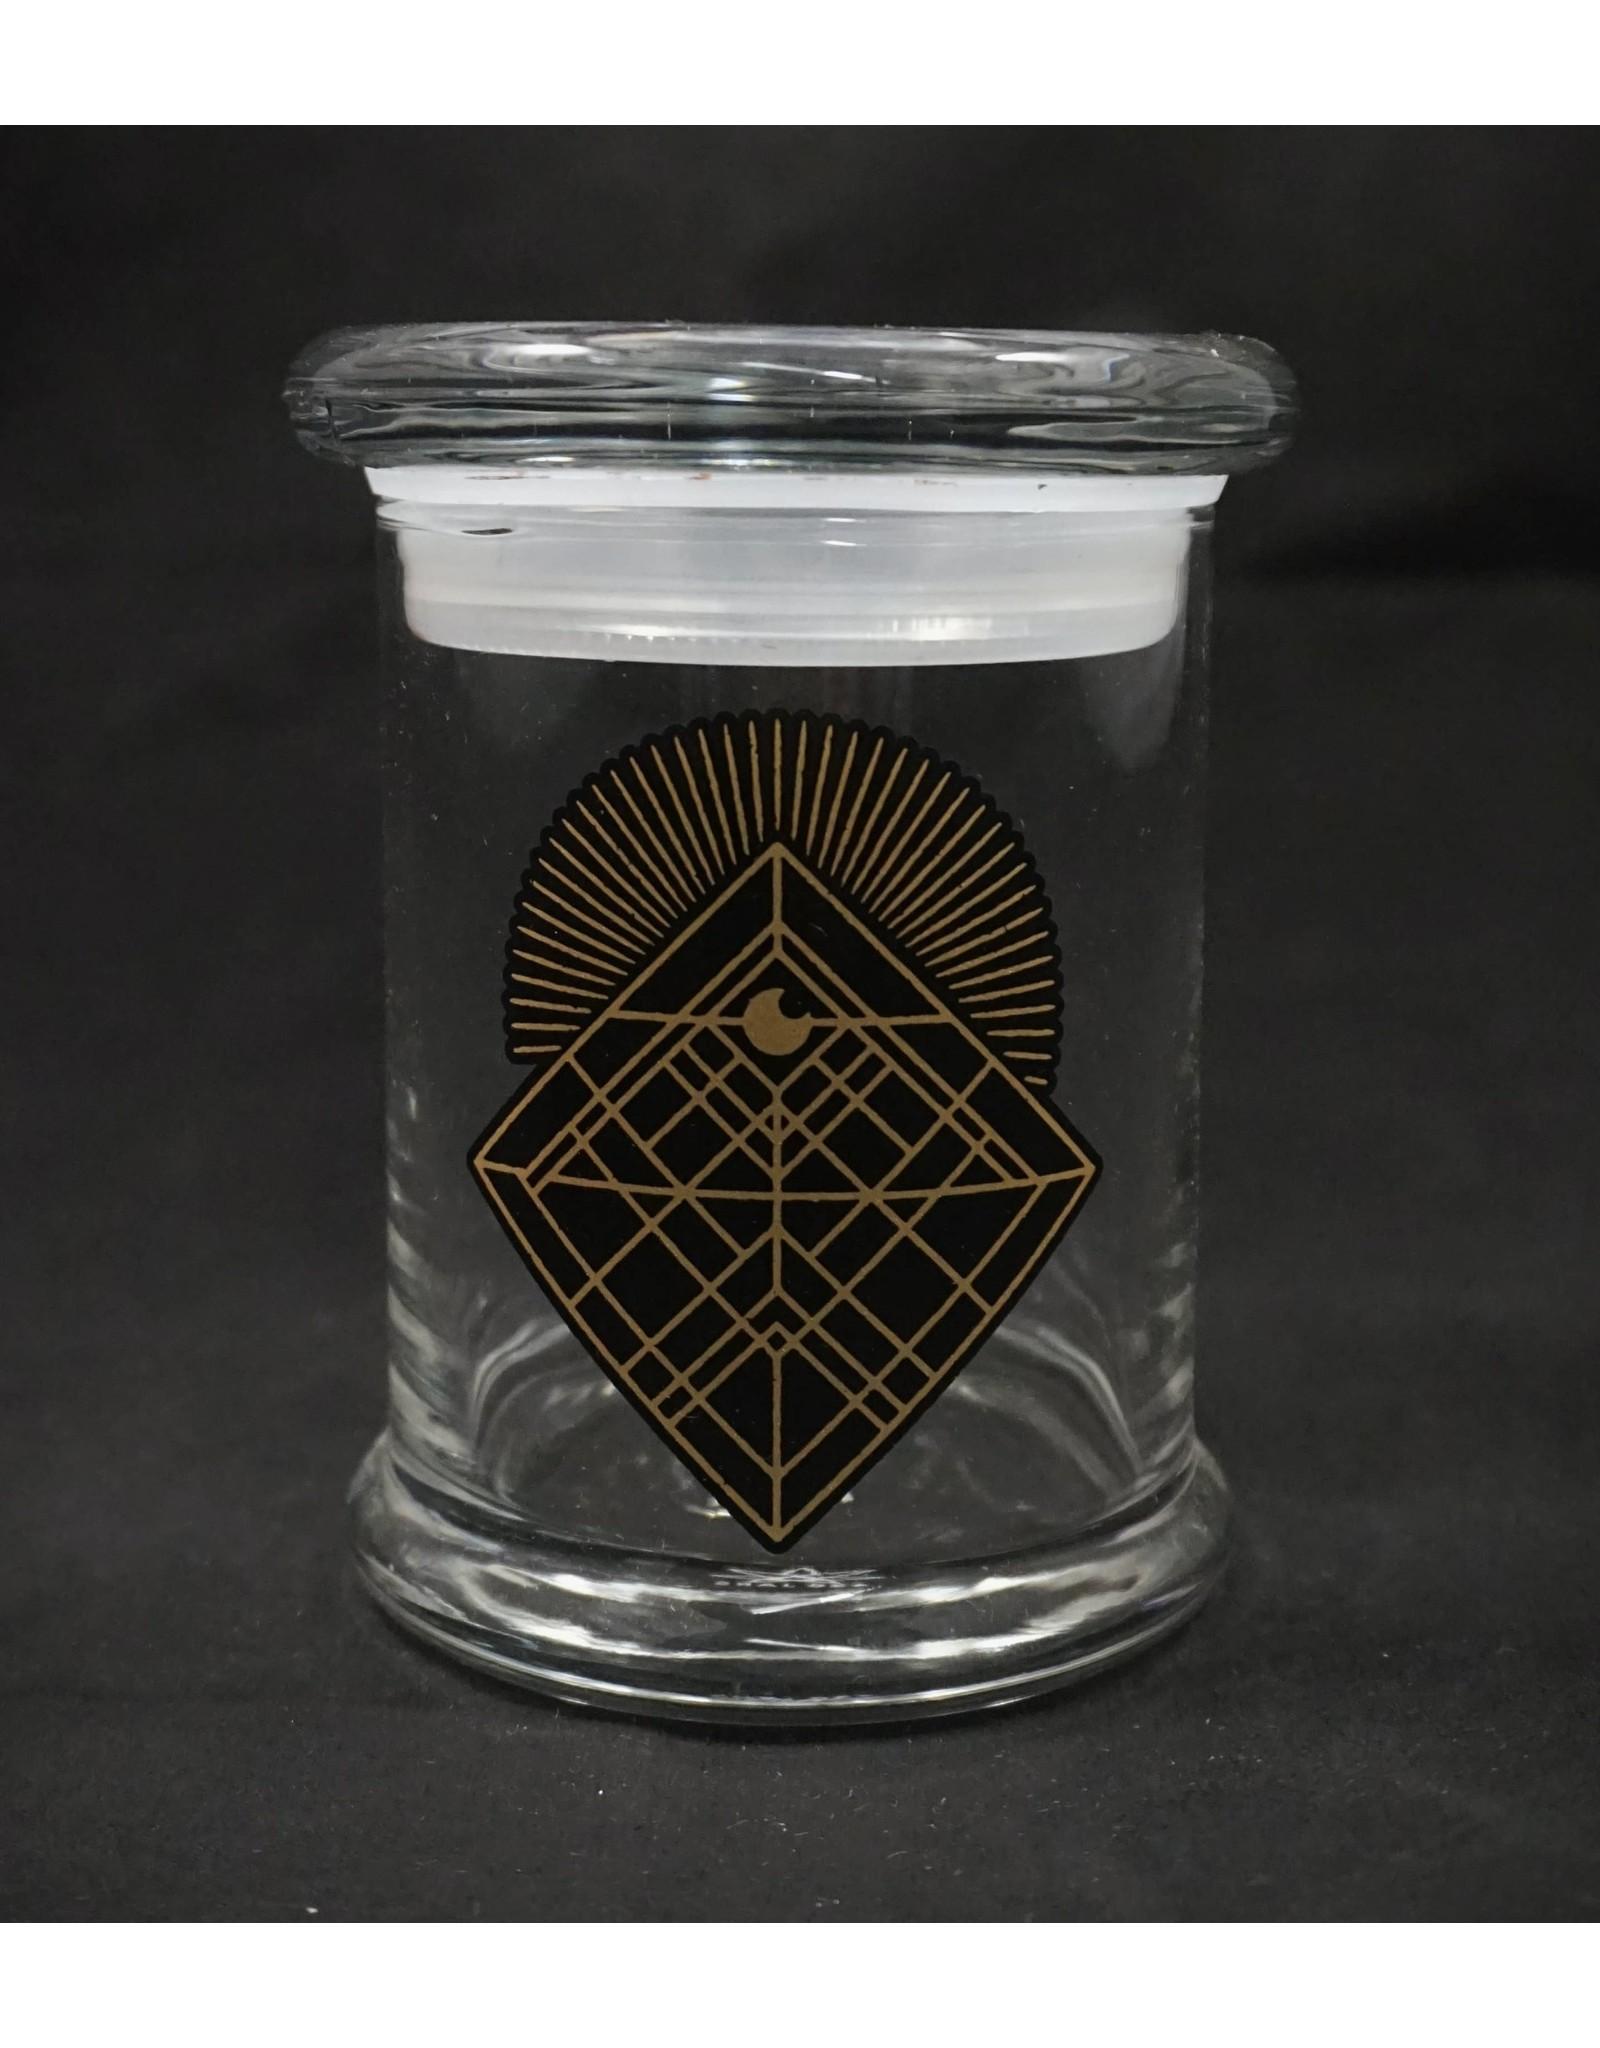 420 Science 420 Science Jars Medium Diamond Intersect Pop Top